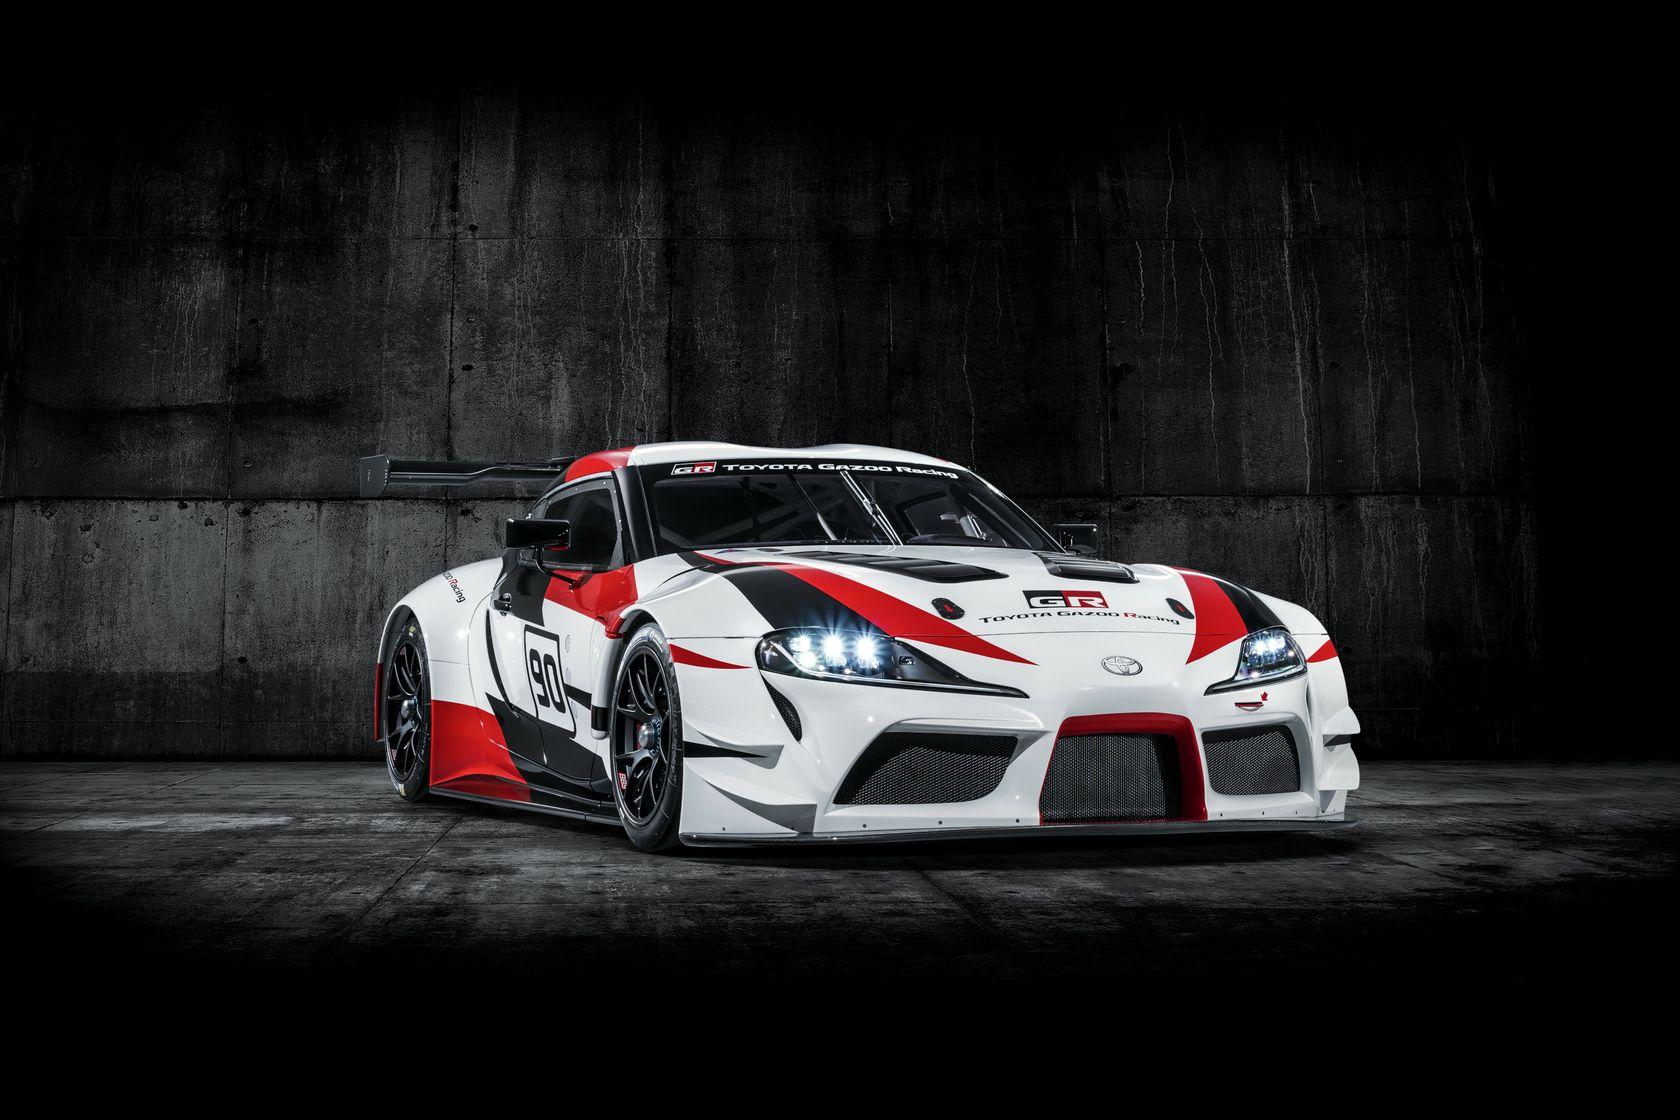 GR Supra Racing Concept - Studio - 02